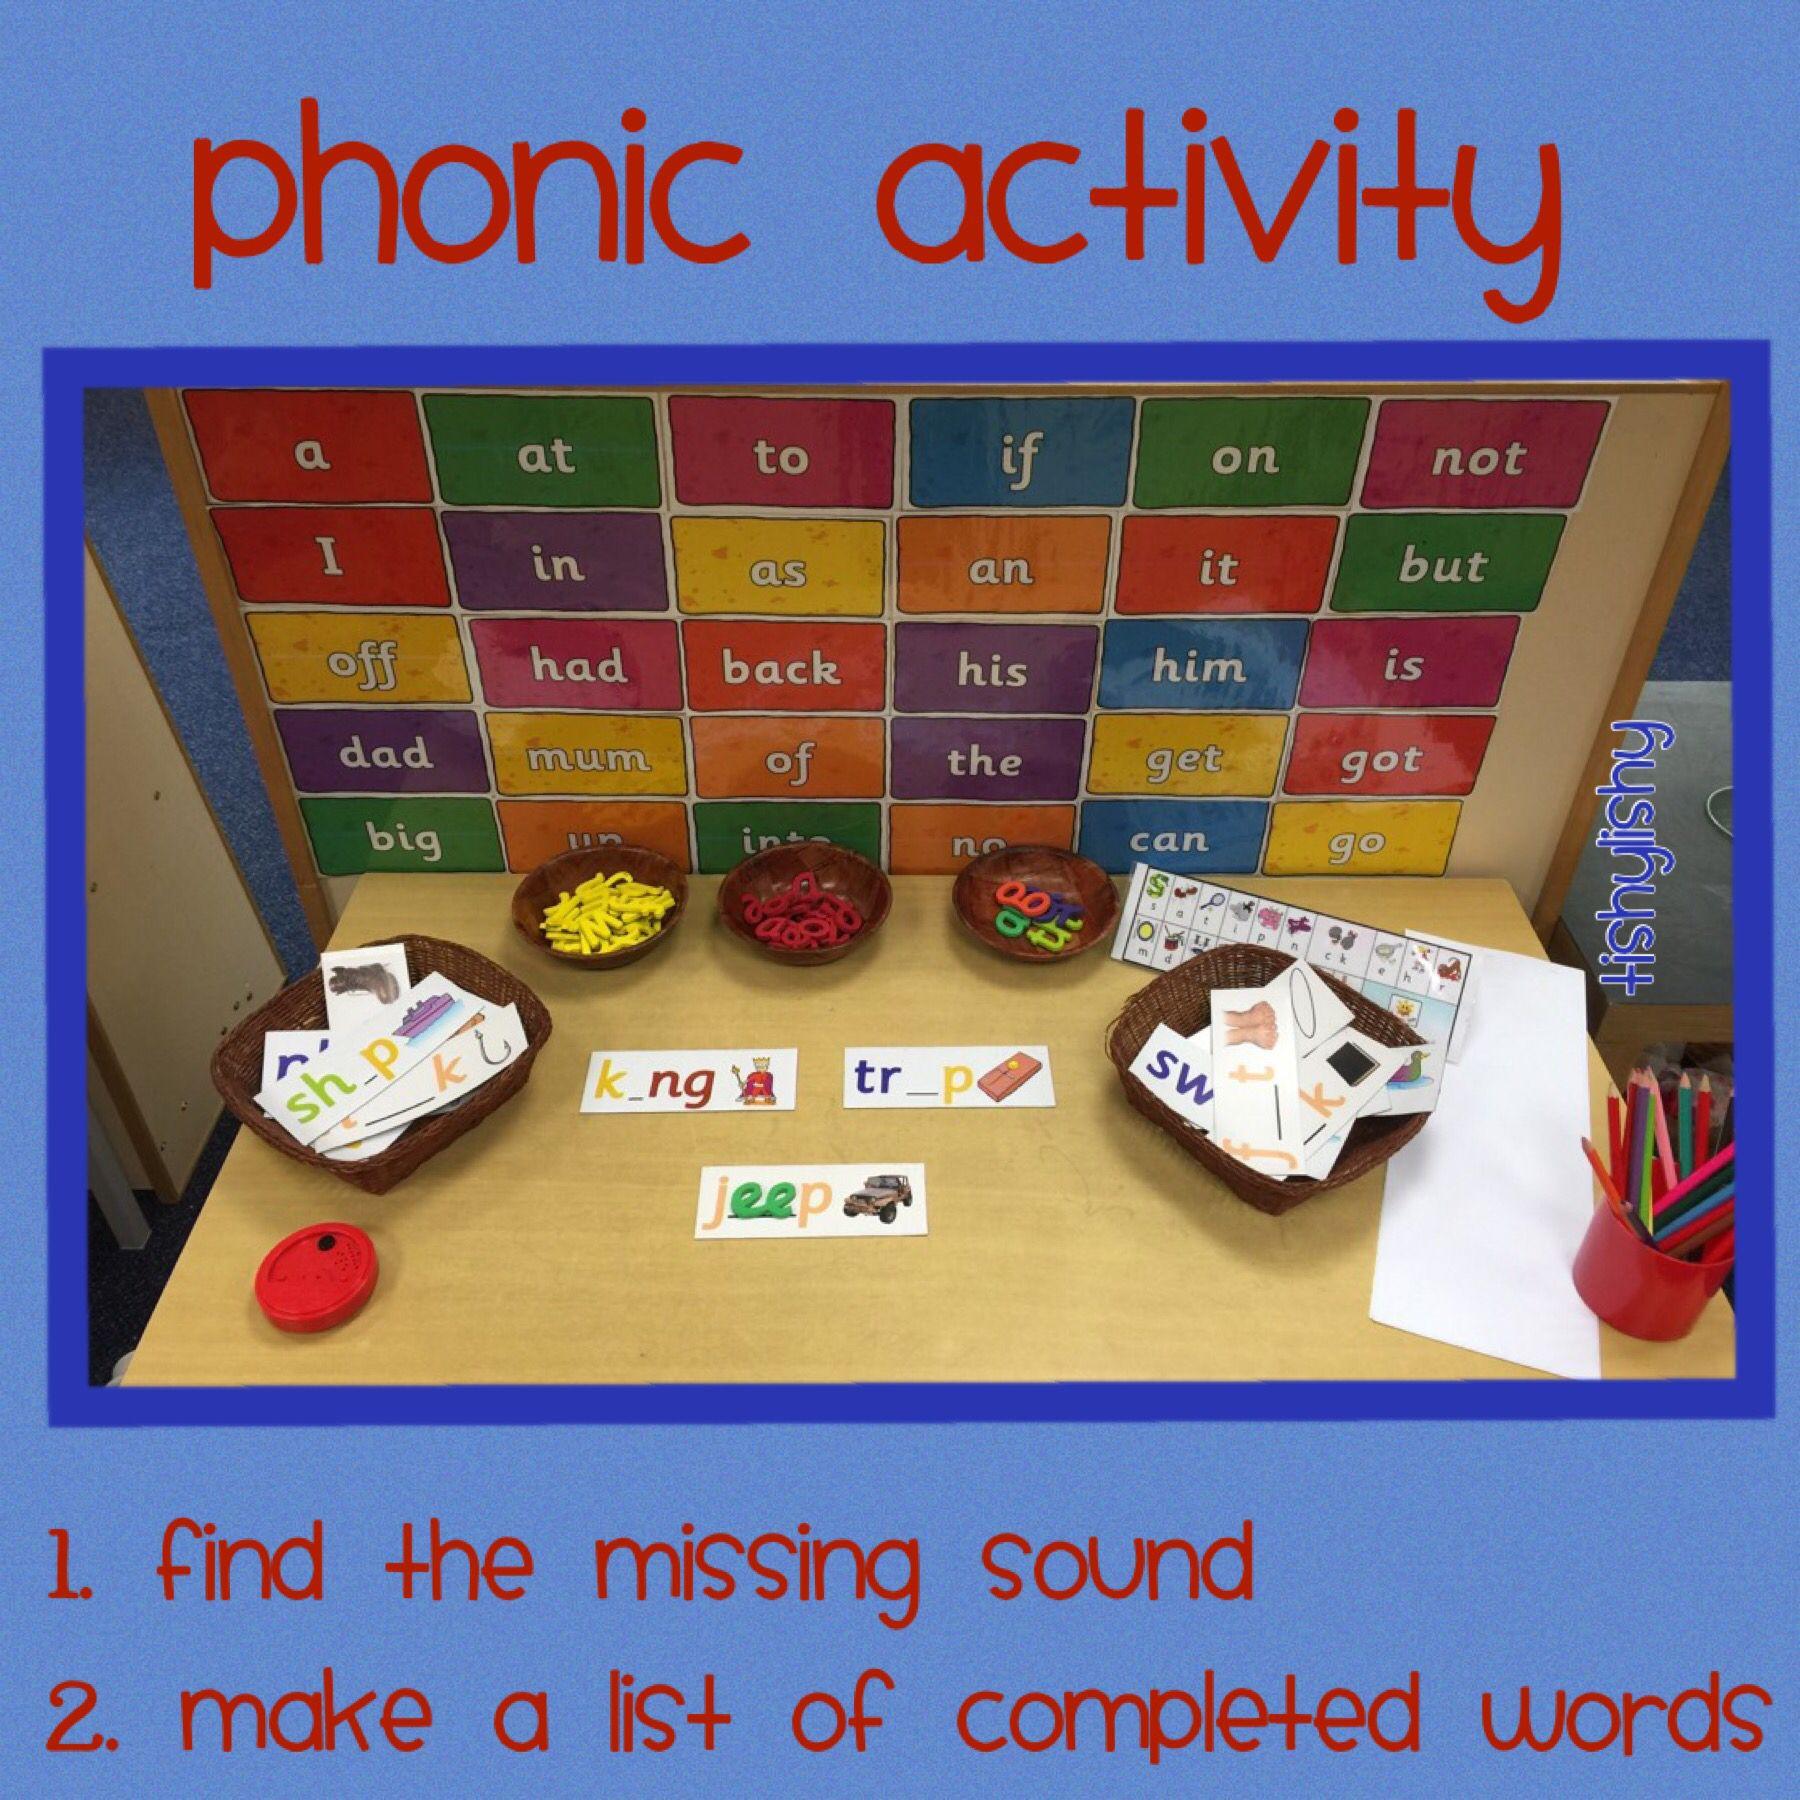 Phonic Activity